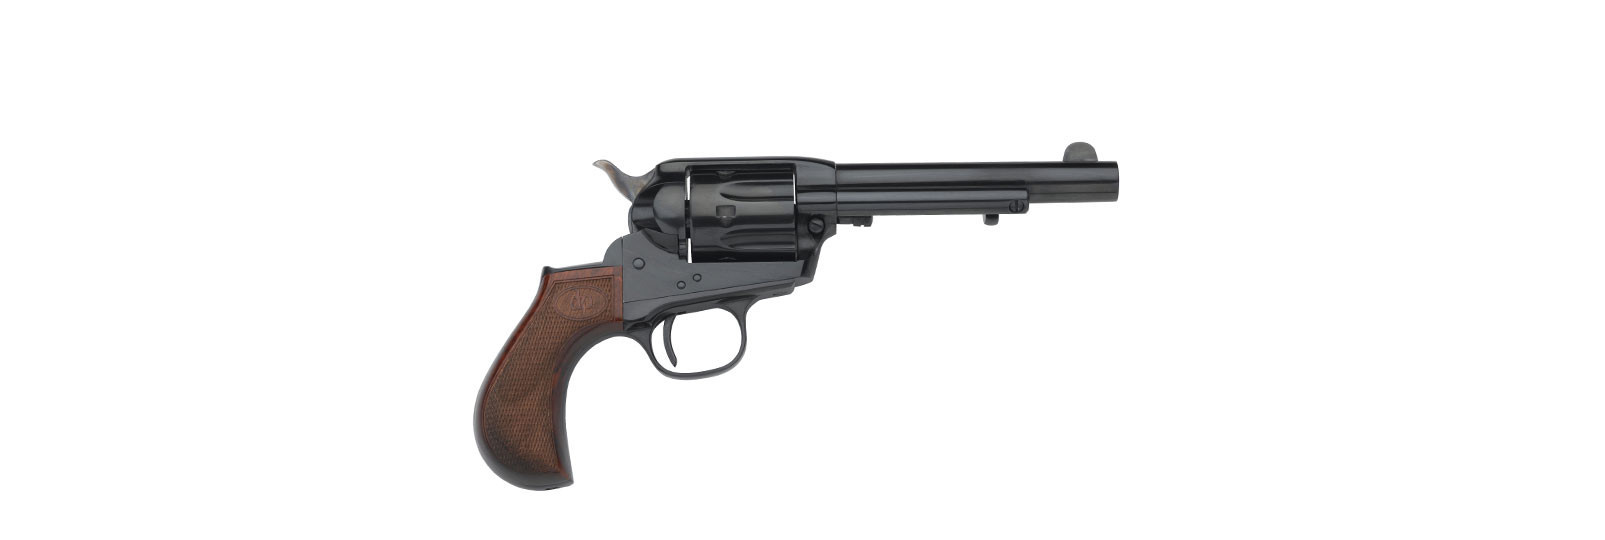 "Doc holliday revolver .38sp 4,2"" blued"